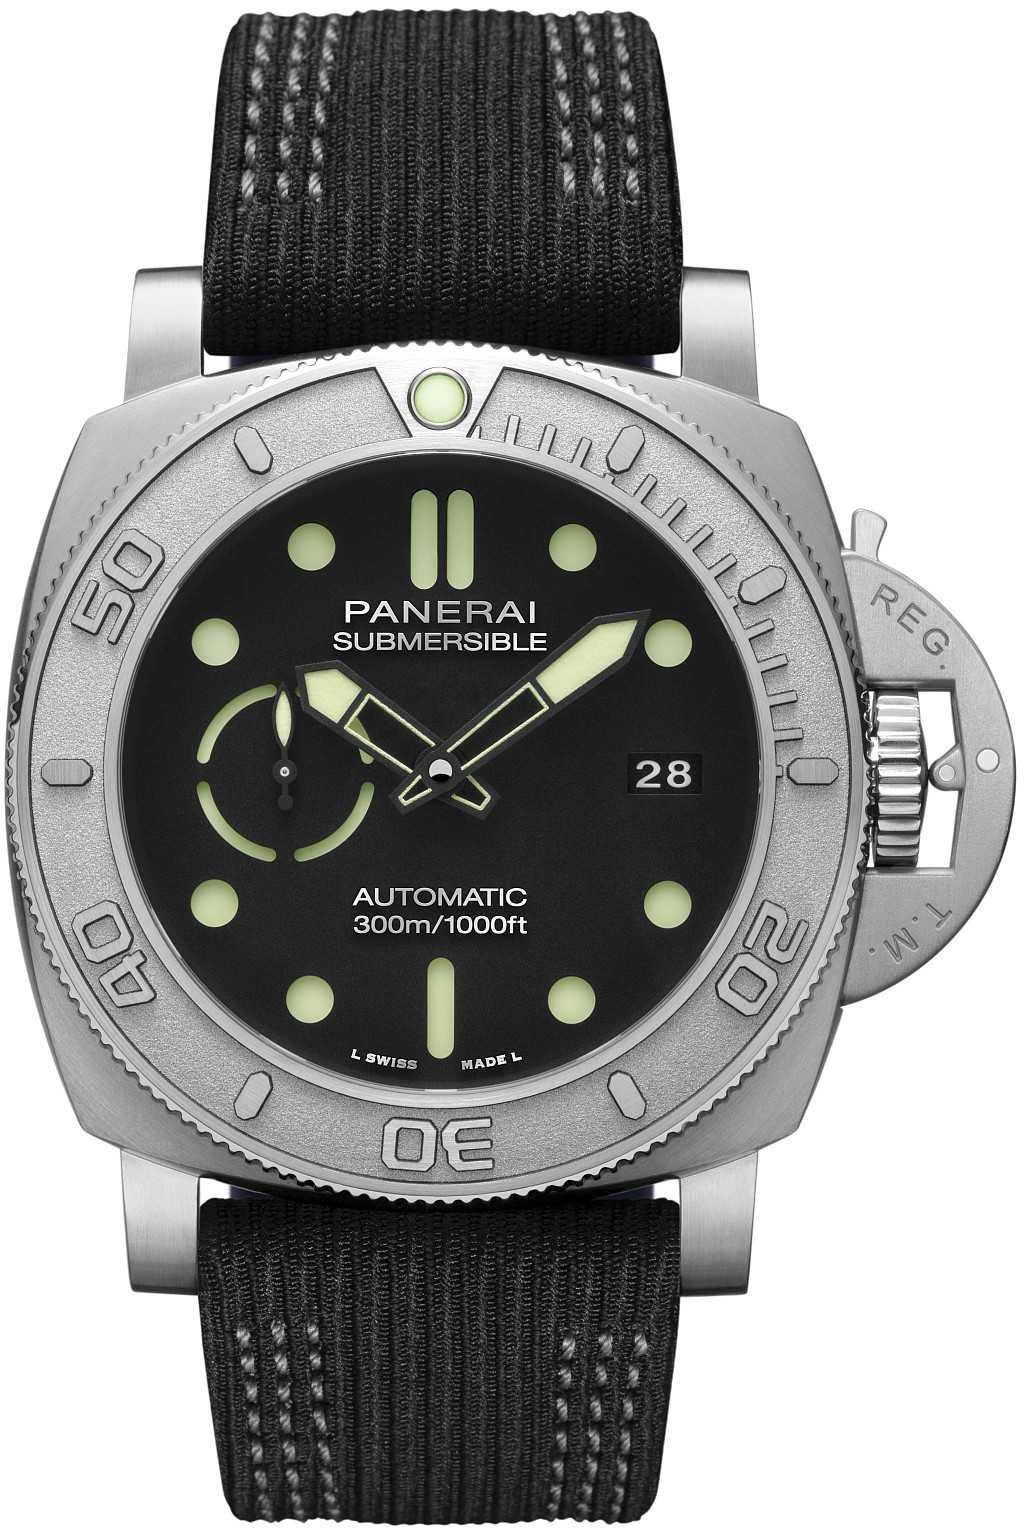 沛納海 Submersible Mike Horn 專業潛水腕錶 ─ 47毫米 PAM984